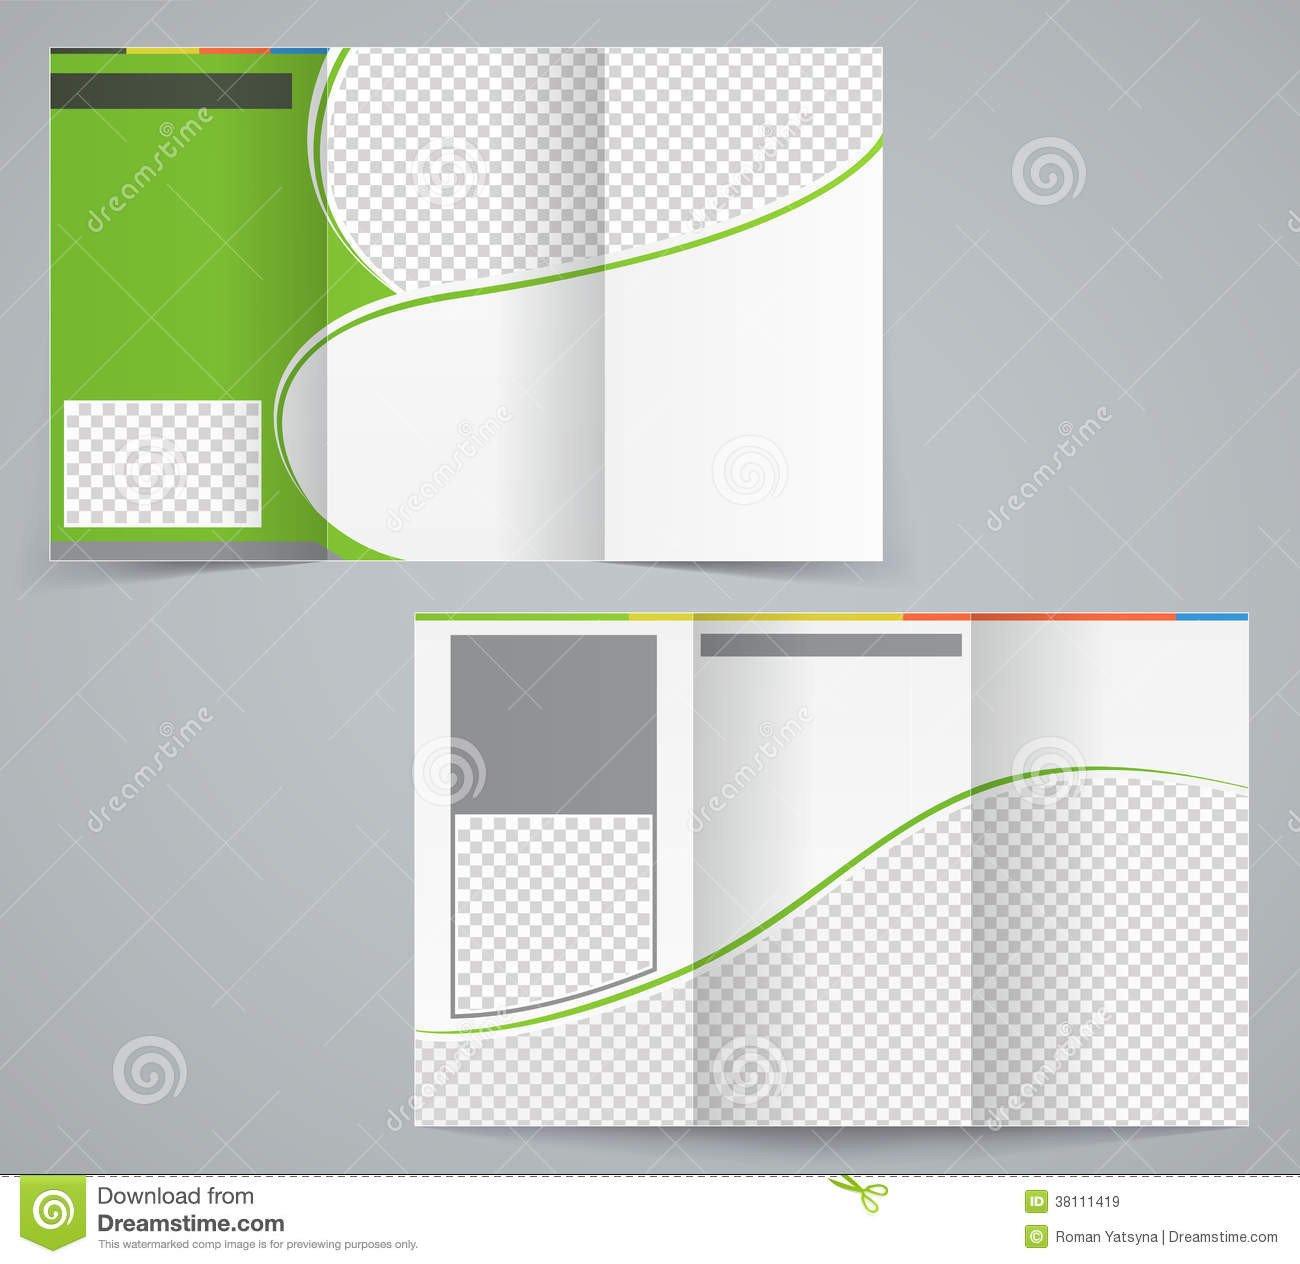 Tri Fold Brochure Template Illustrator Tri Fold Business Brochure Template Vector Green Stock